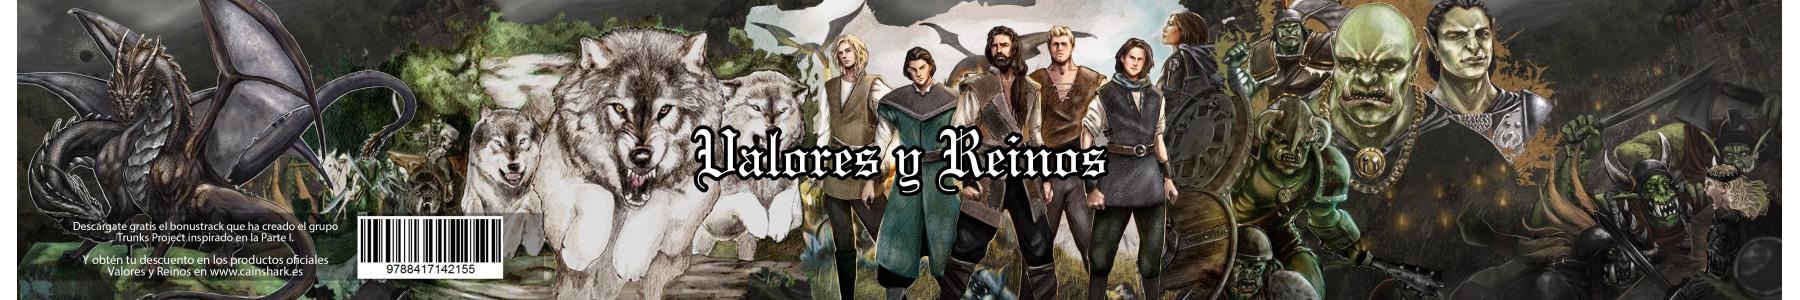 Valores y Reinos